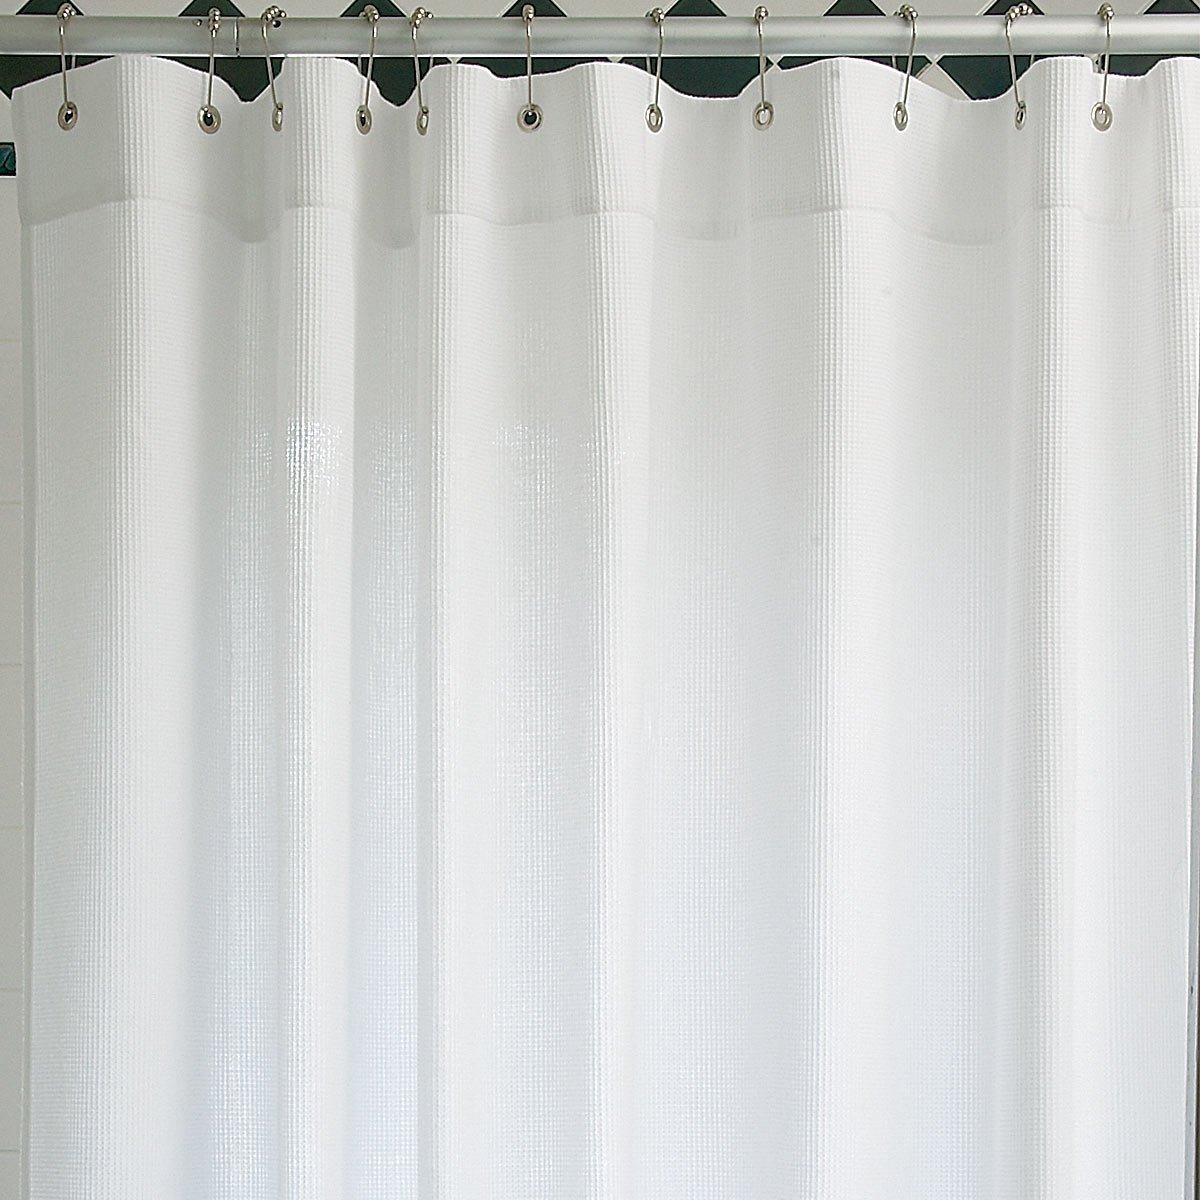 Ankara_Curtain_1_Detail_new.jpg